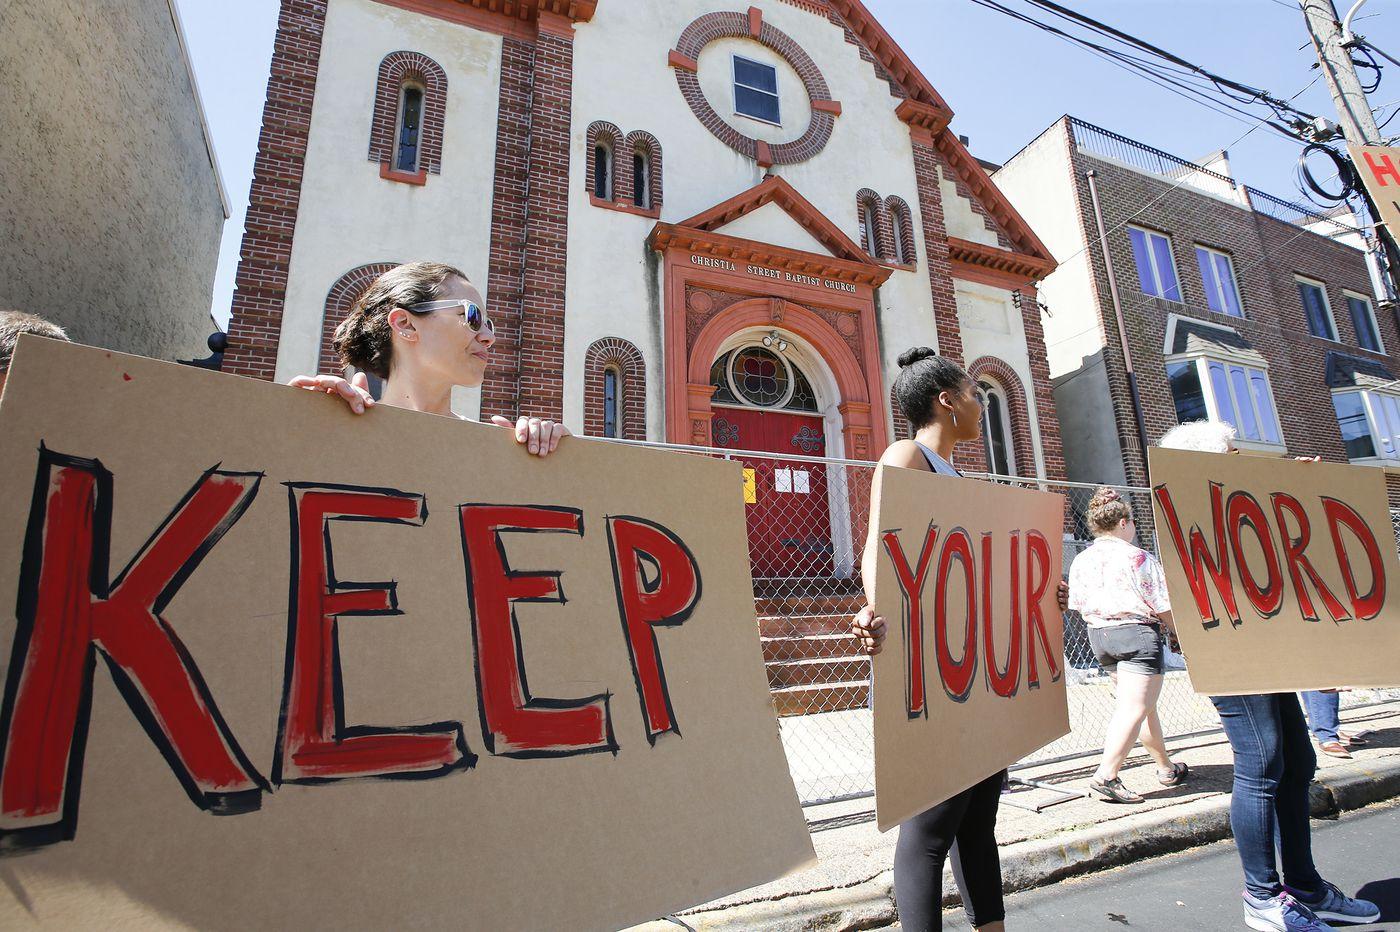 Developer Ori Feibush: I'm walking away from the Bella Vista church after I demolish it